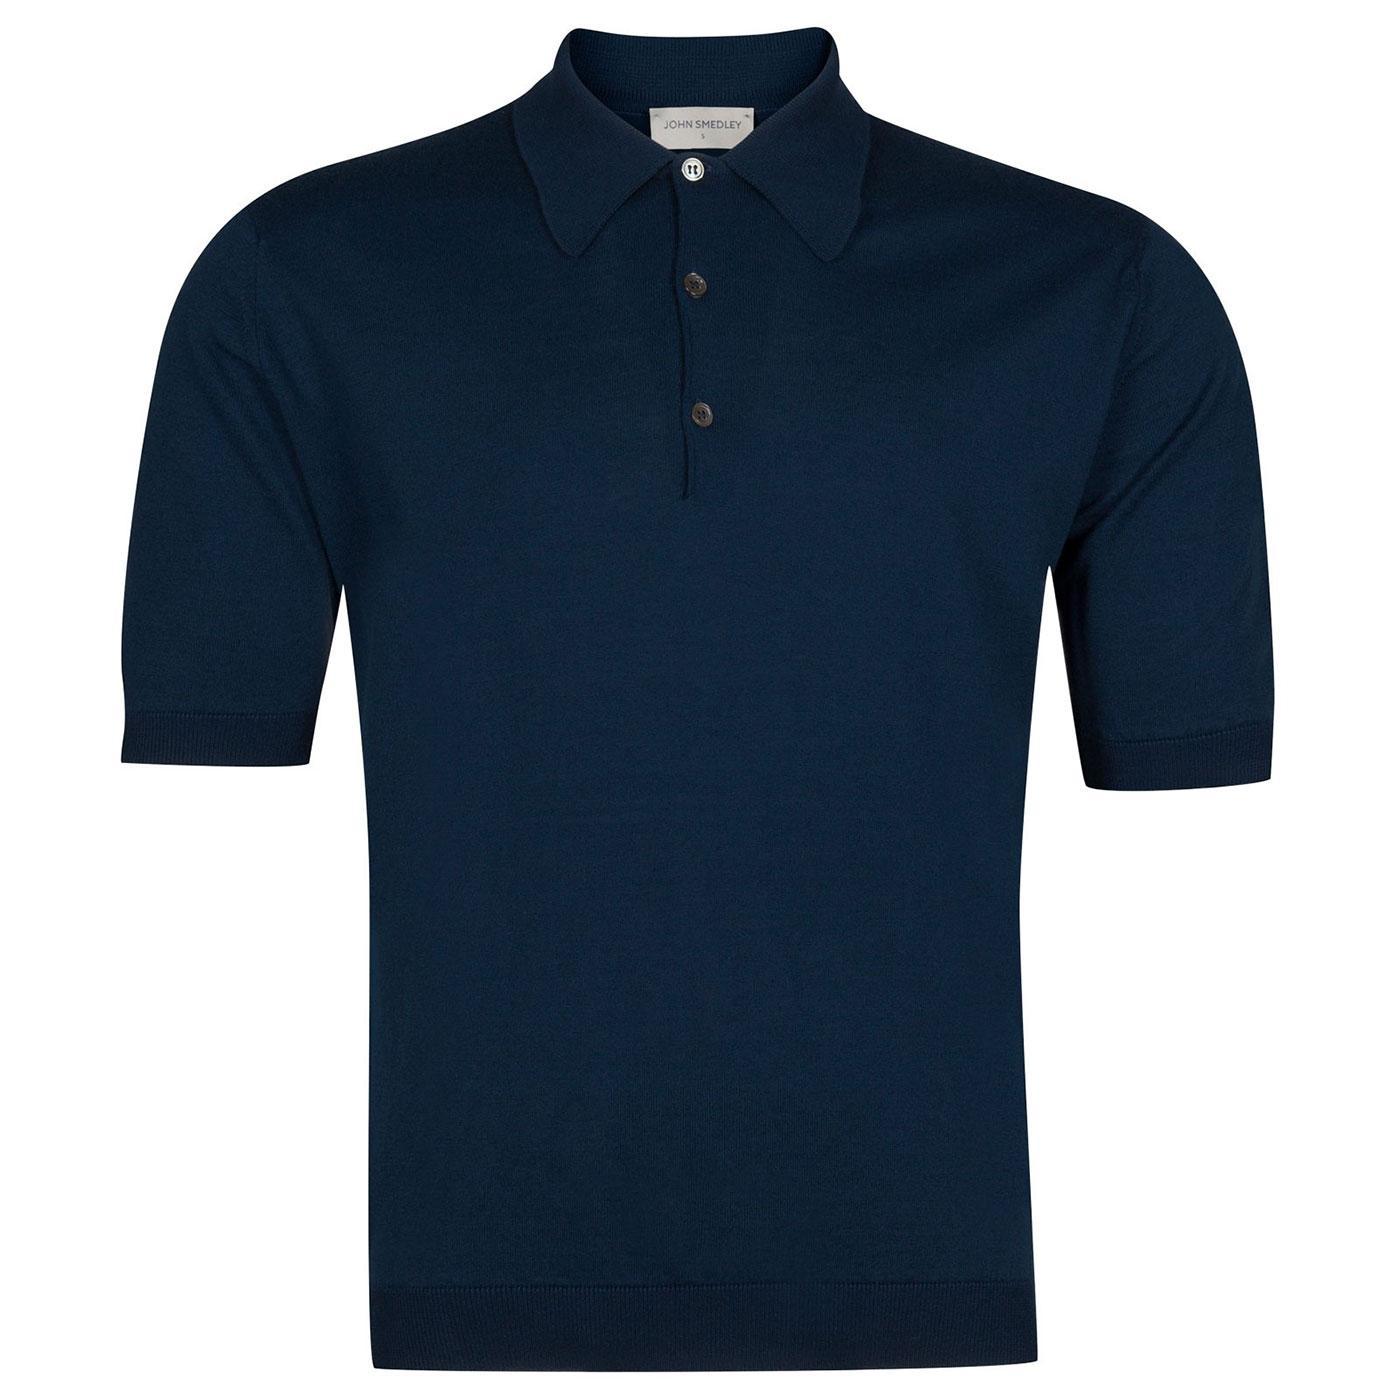 Isis JOHN SMEDLEY Knitted Retro Mod Polo Shirt I